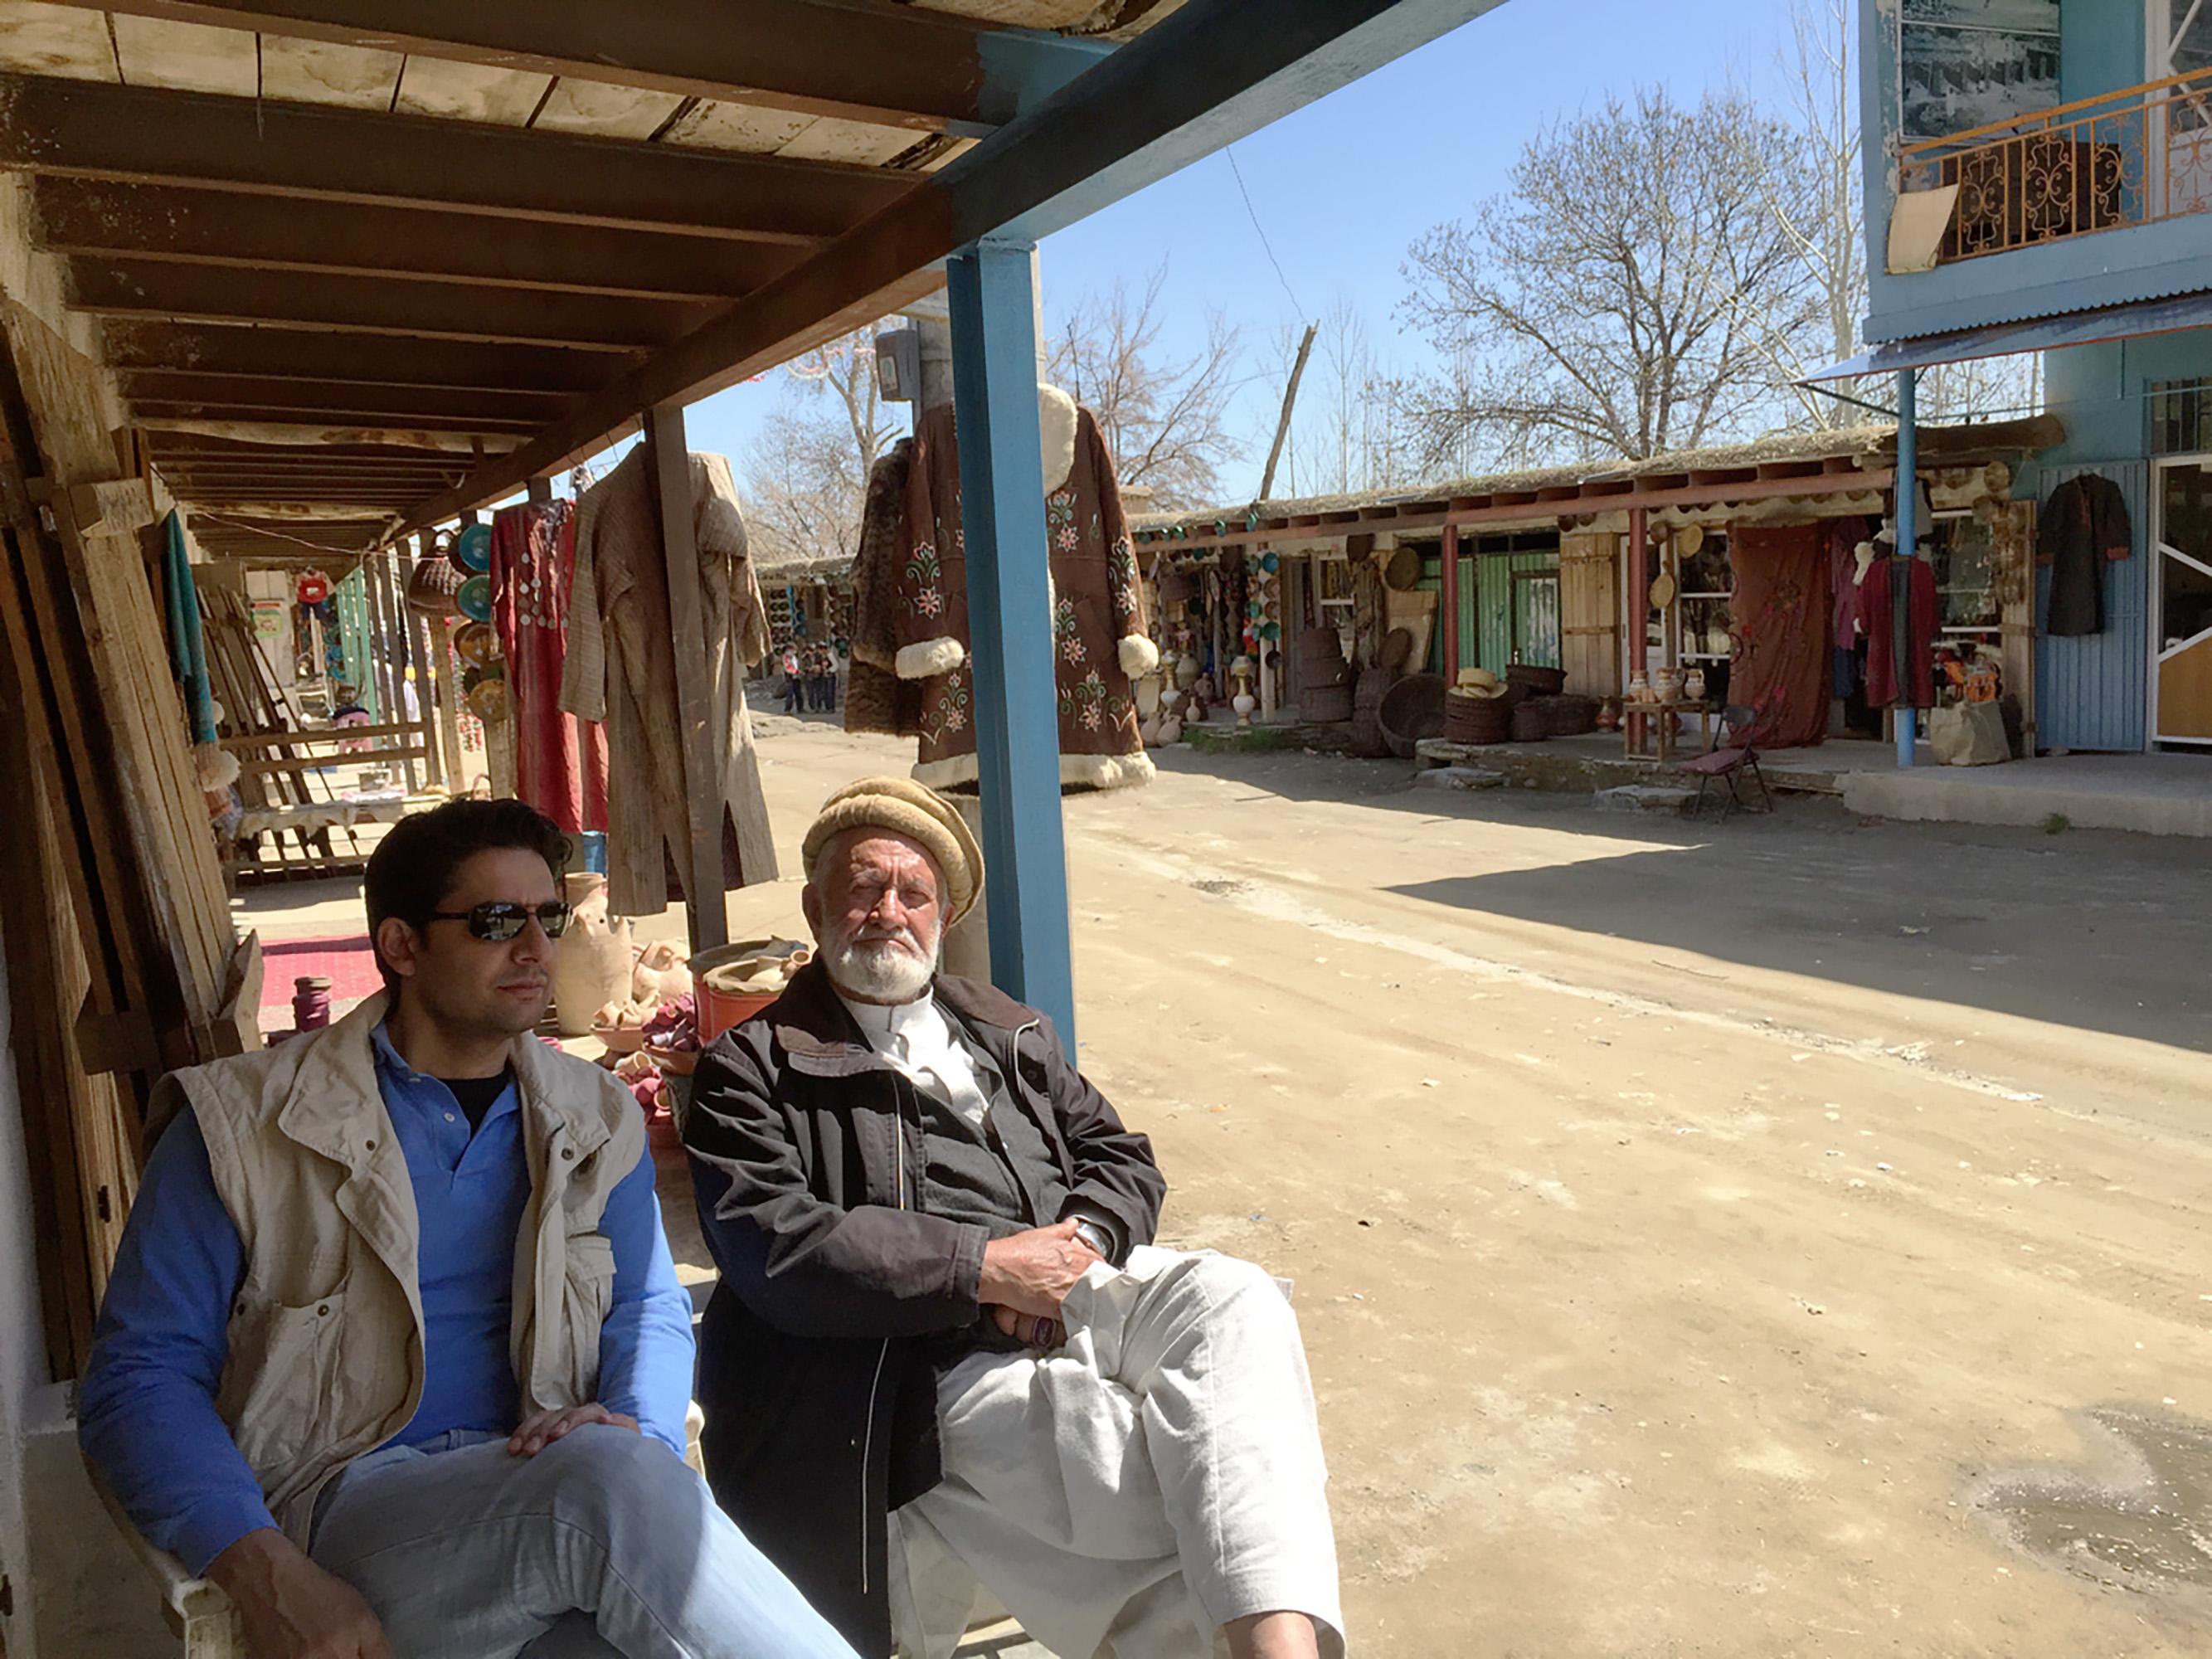 Ali Istalifi and Abdul Istalifi in Istalif Afghanistan